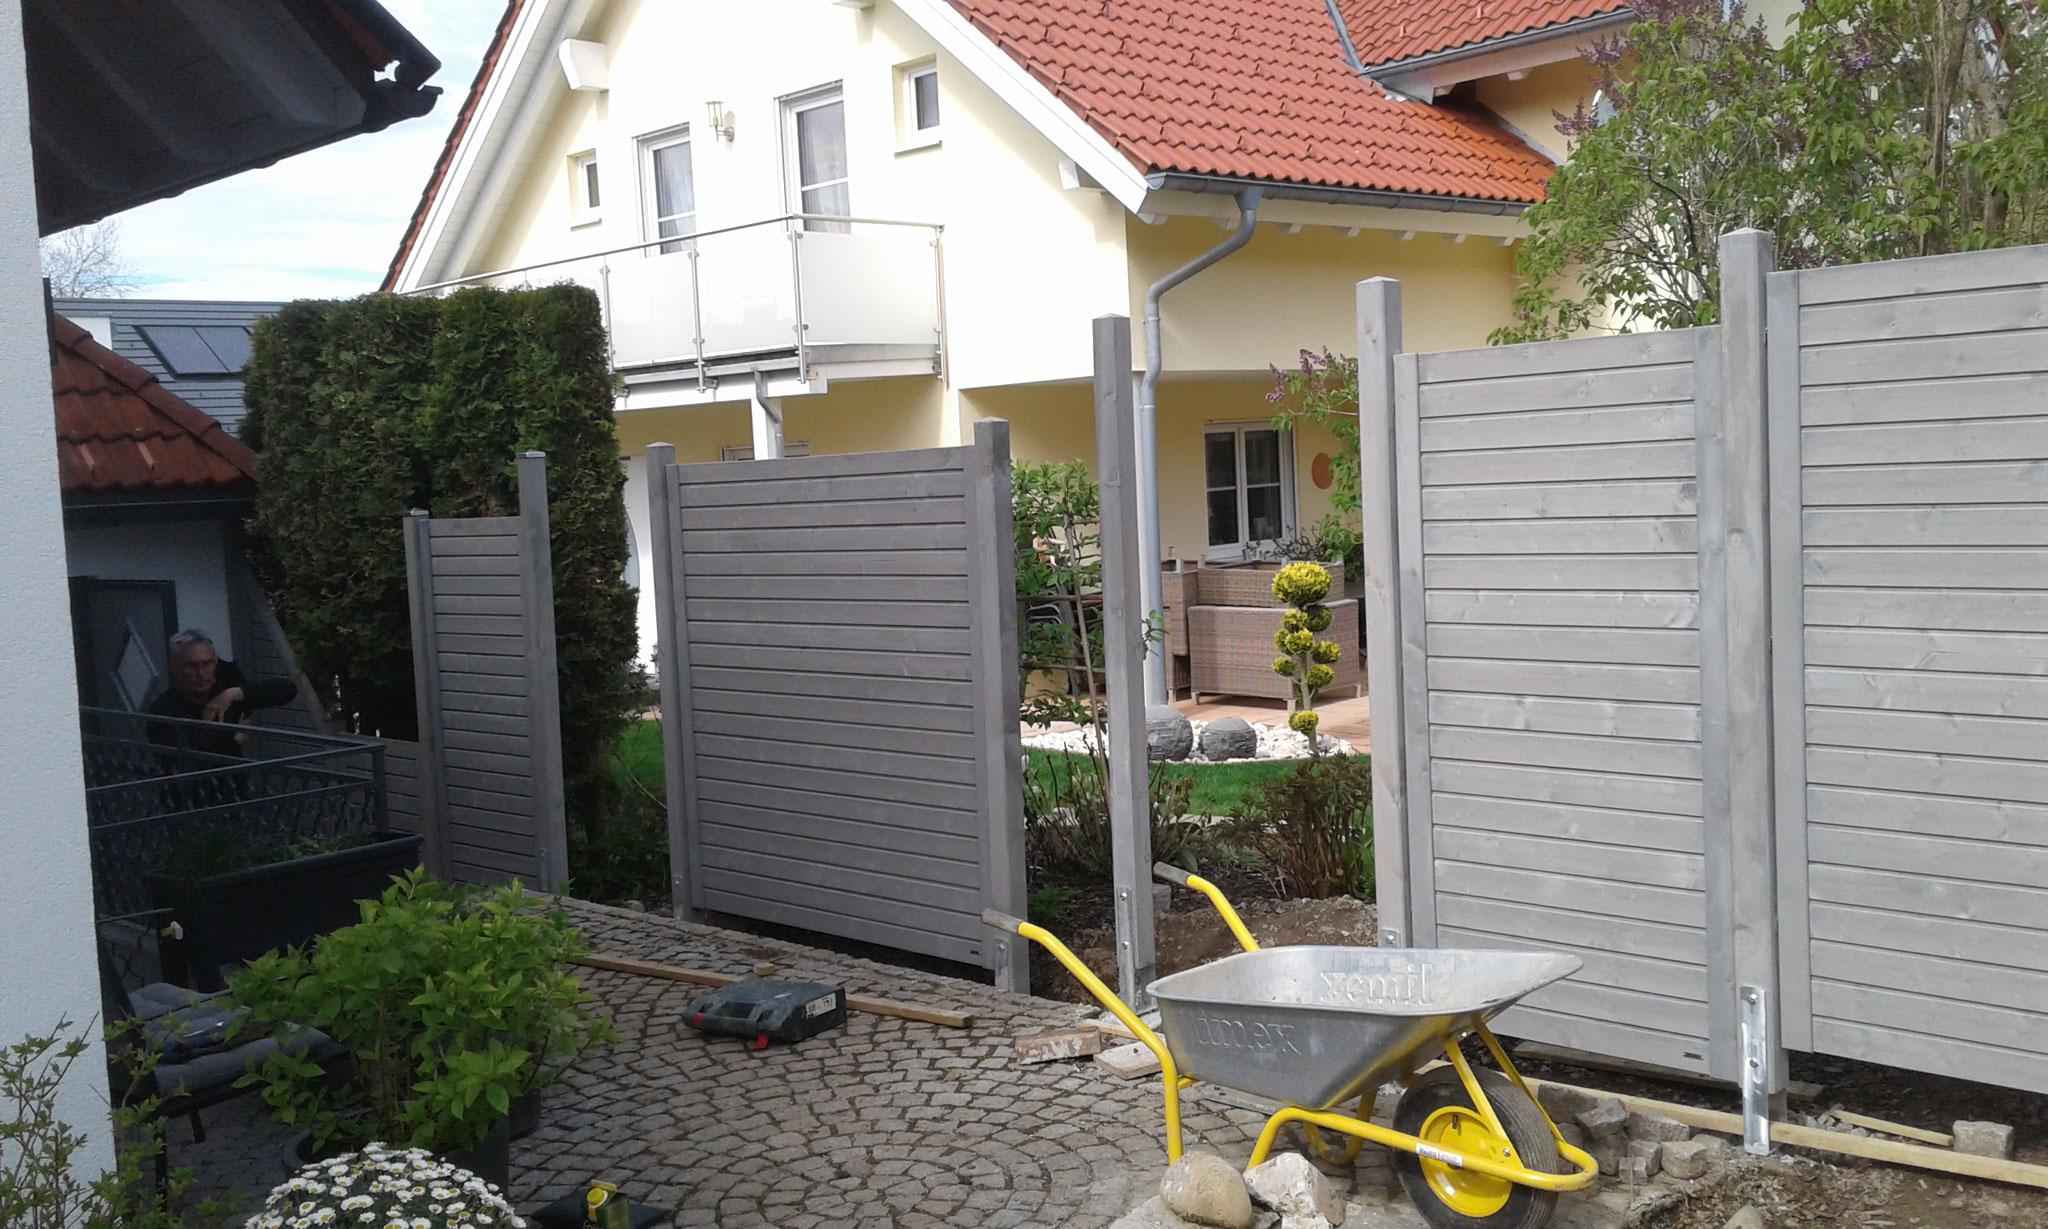 Gartenprojekt Wangen 2017 - BAUPHASE